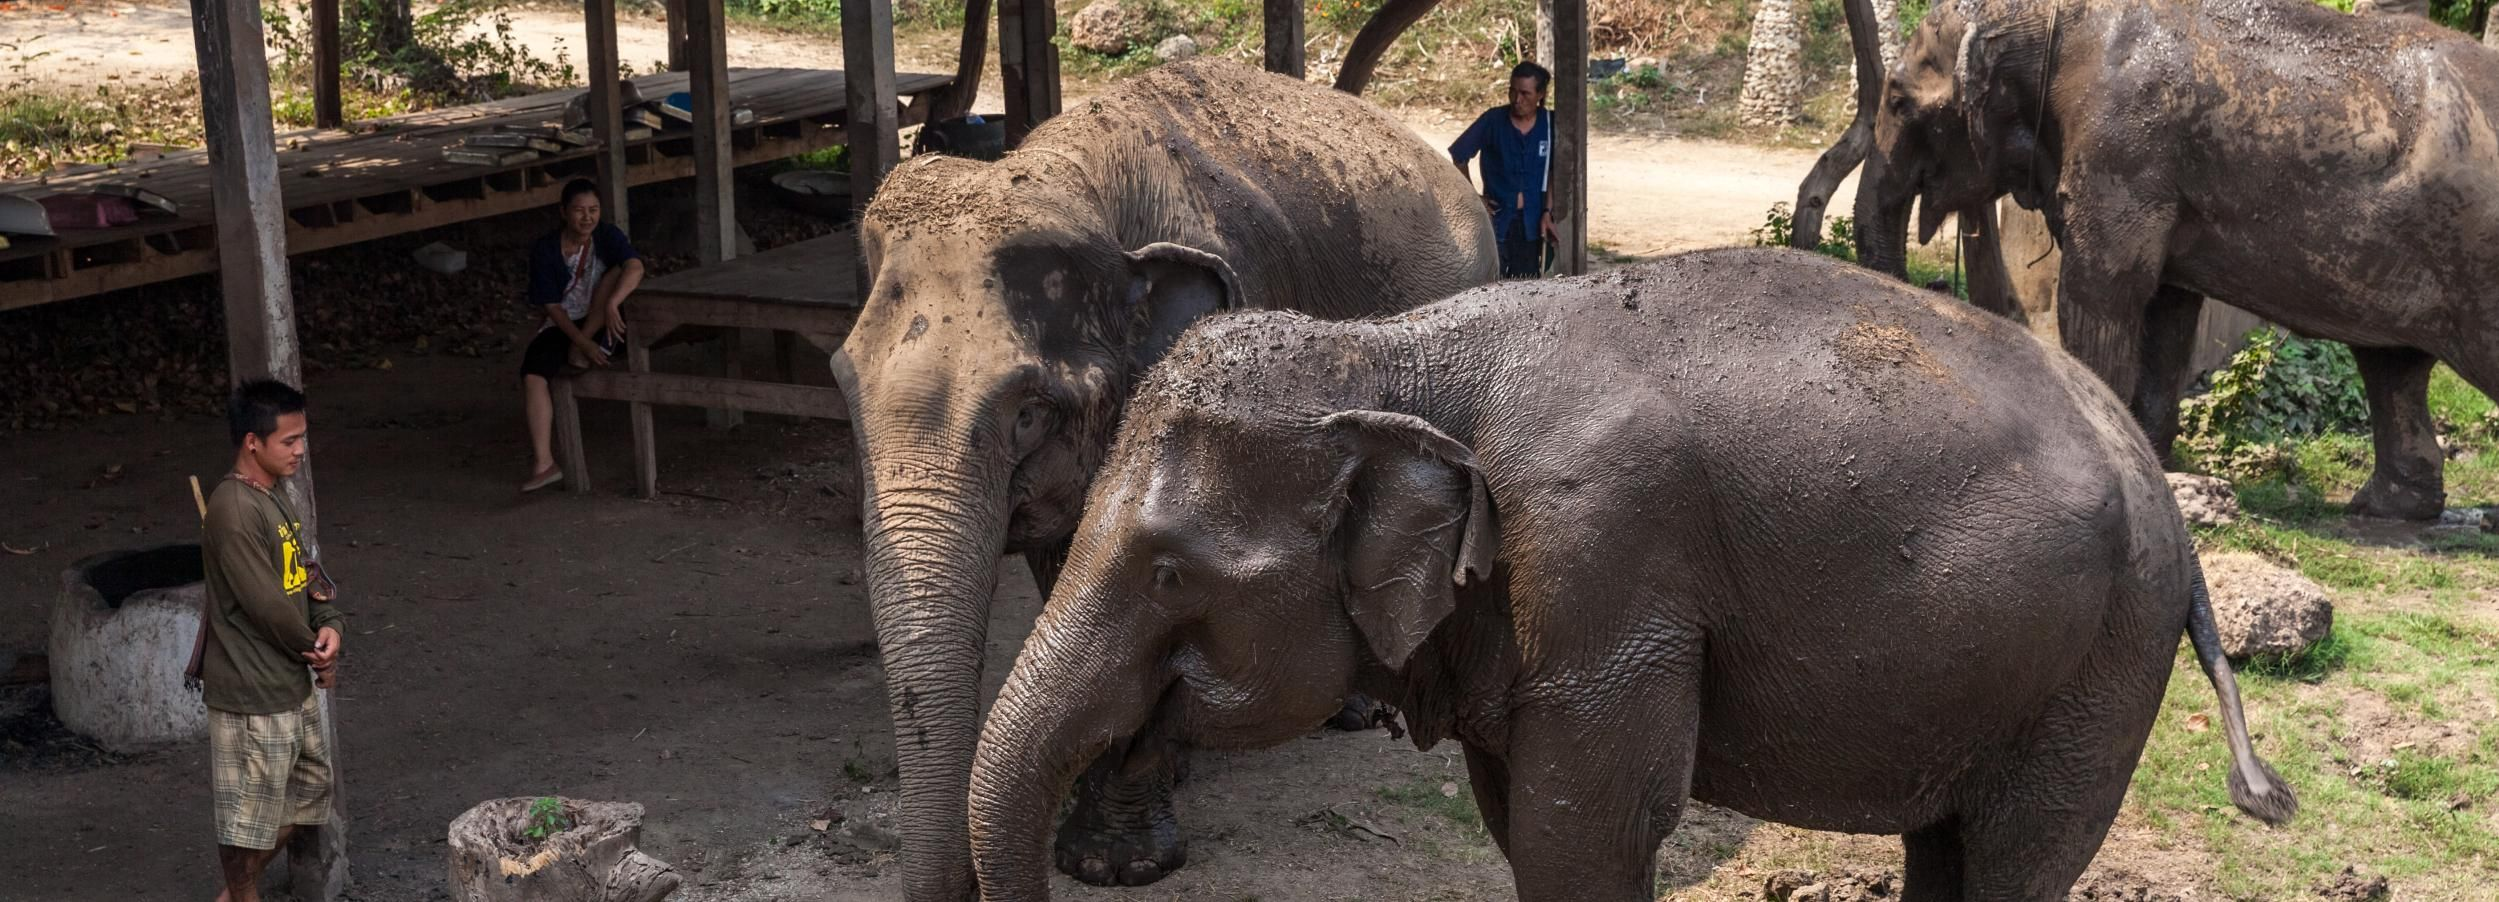 Elefanten-Schutzzentrum & Kanchanaburi Highlights Privattour